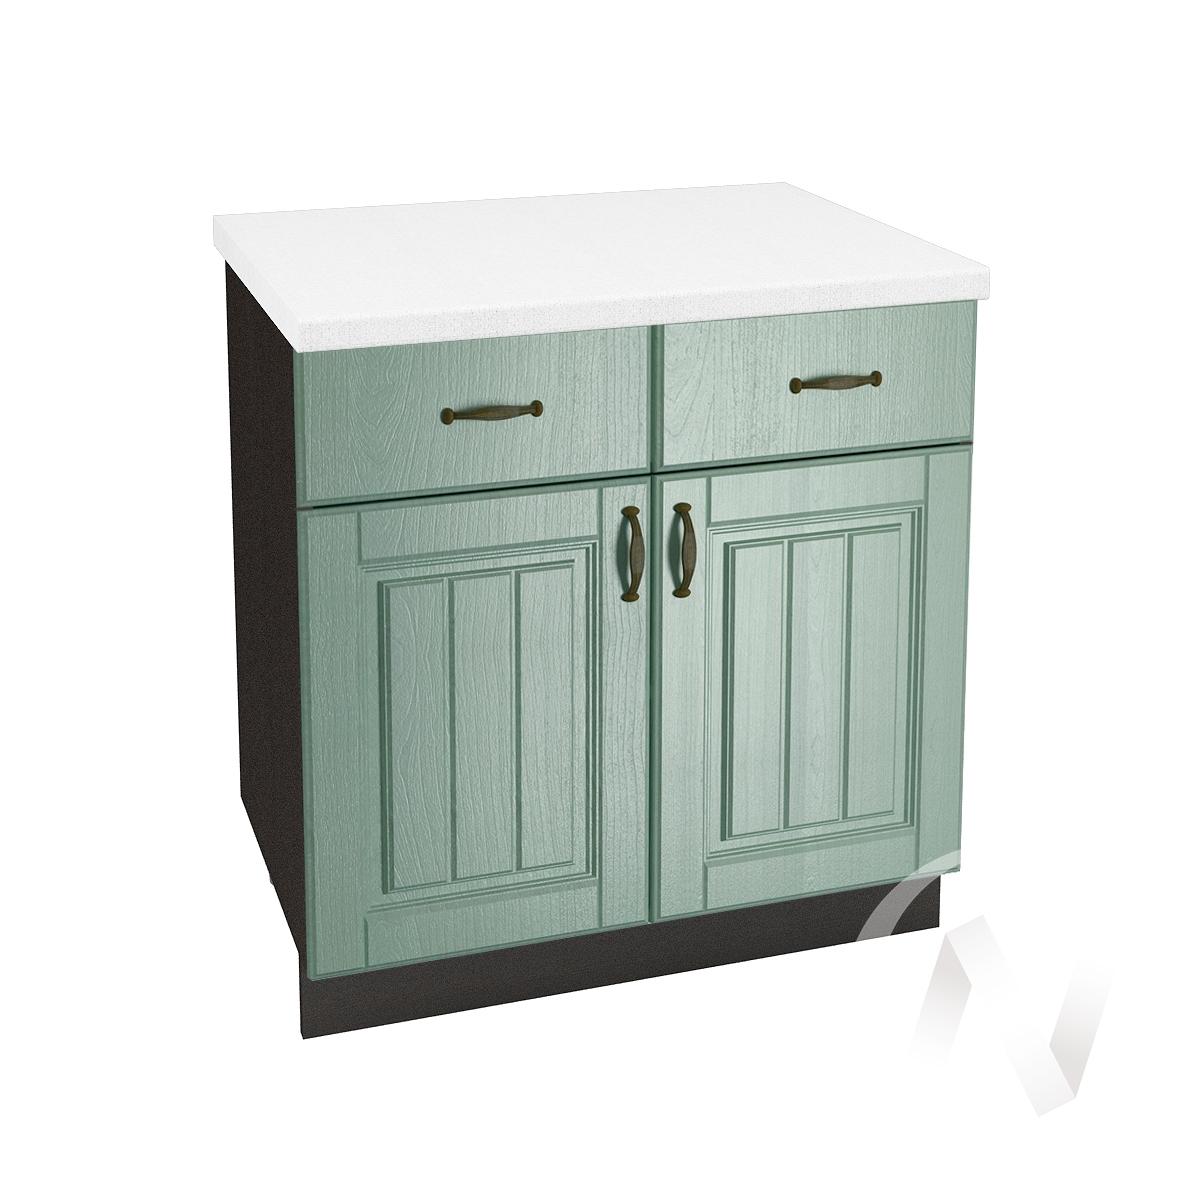 "Кухня ""Прованс"": Шкаф нижний с ящиками 800, ШН1Я 800 (корпус венге)"